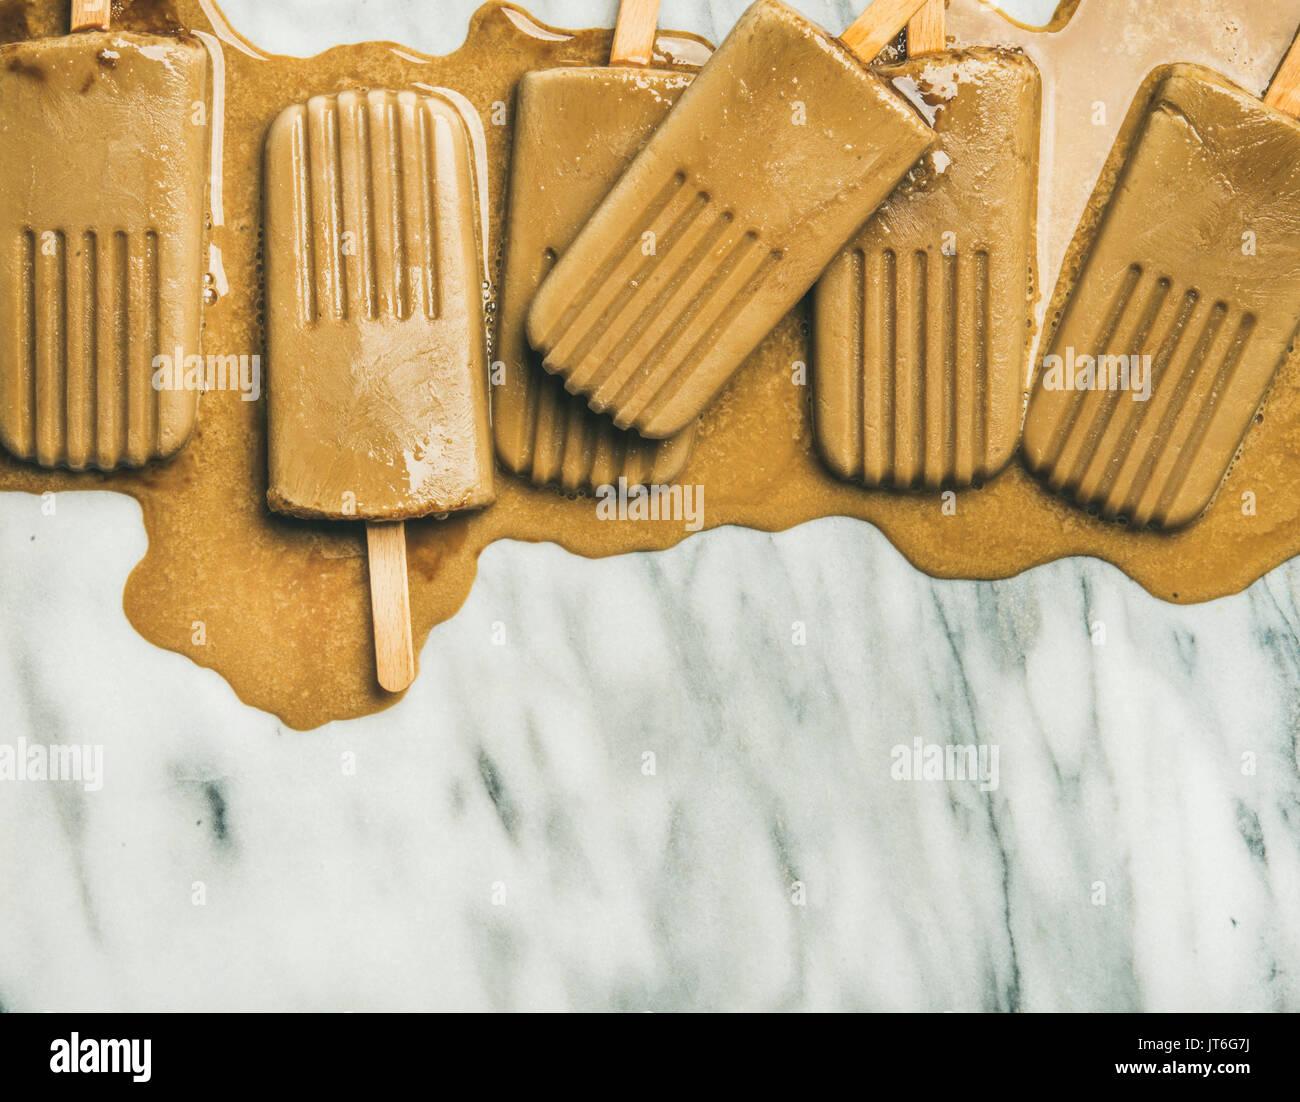 Summer healthy vegan frozen dessert. Flatlay of melting coffee latte popsicles over light grey marble background, - Stock Image